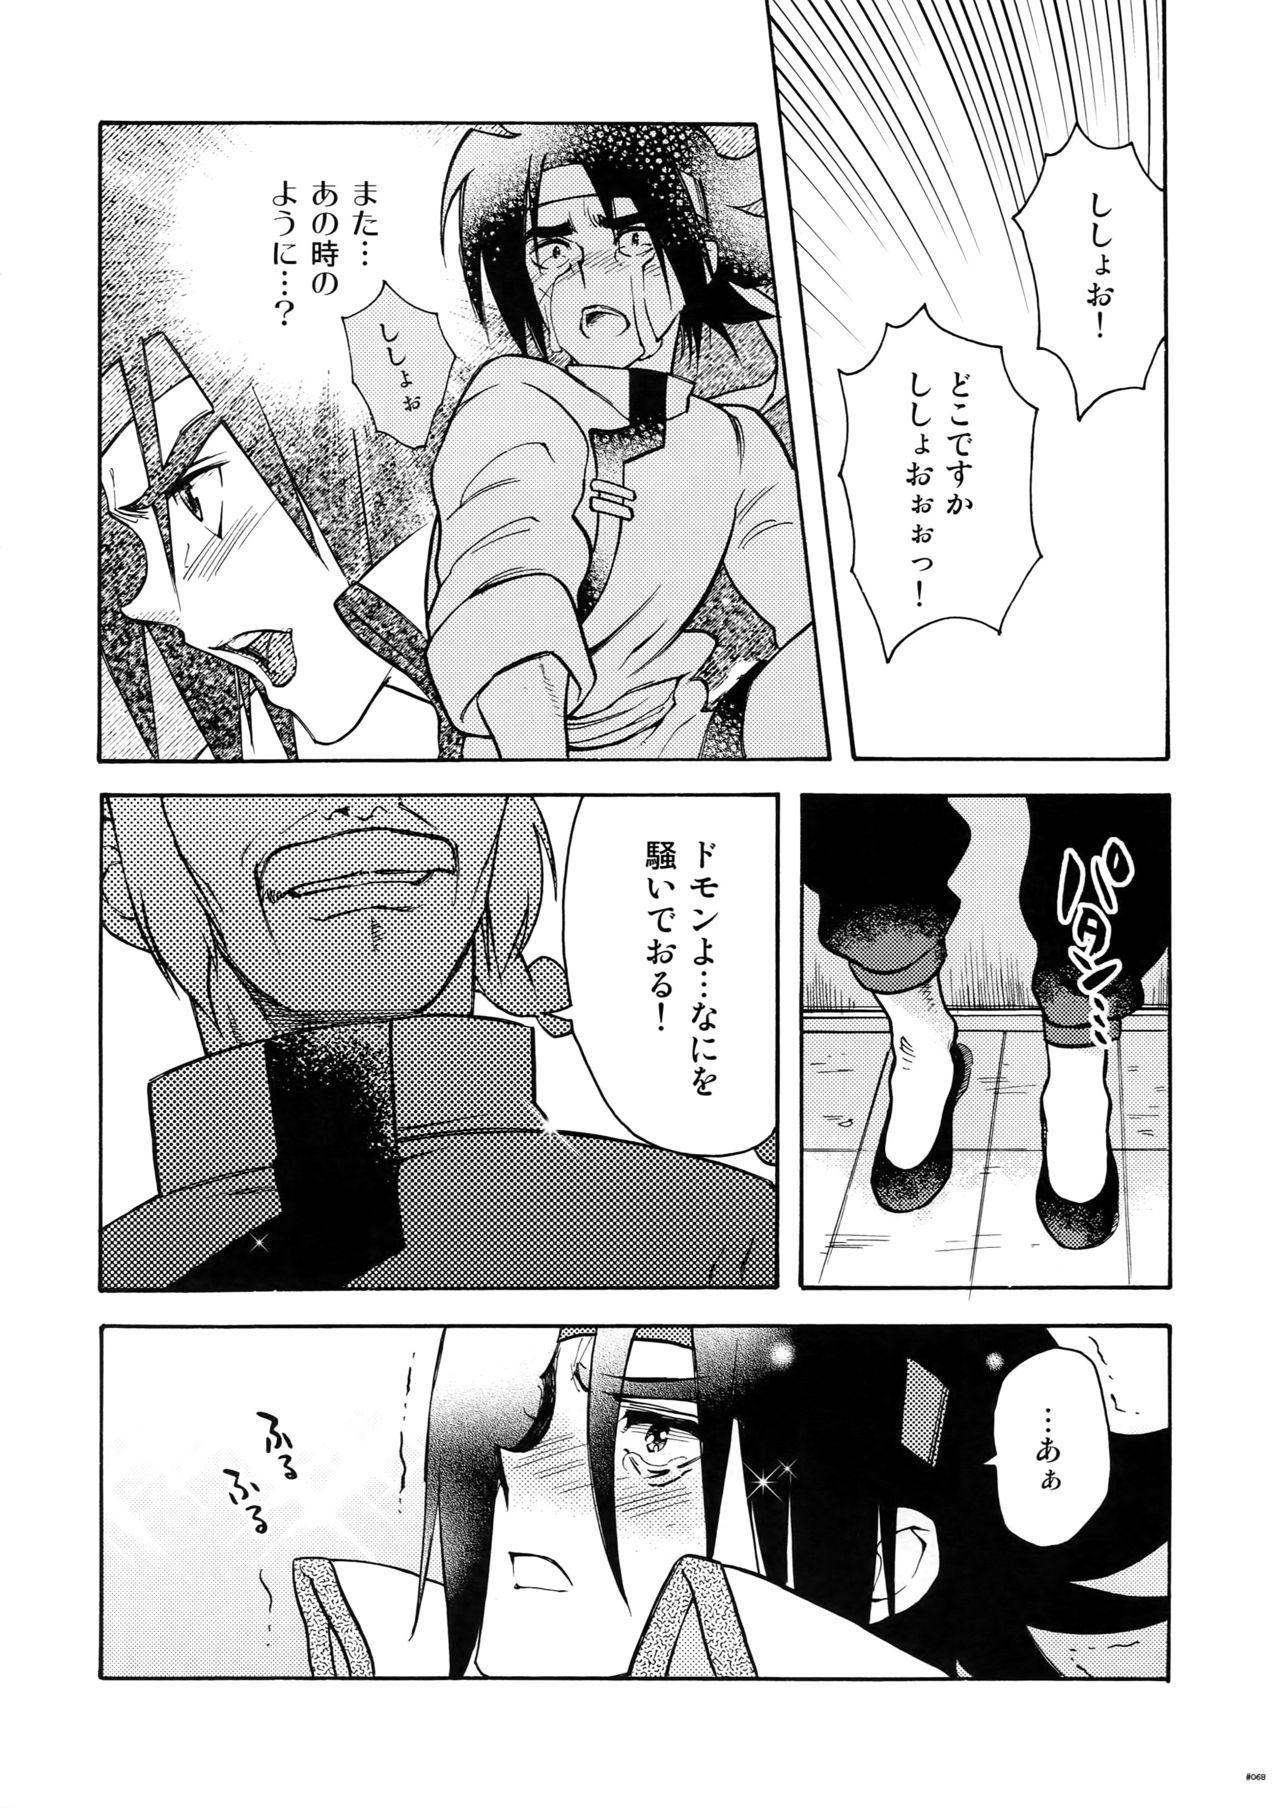 [Article 60 of Criminal Code (Shuhan)] G-gan Josei-Muke Sairoku-Shuu (G Gundam) 67